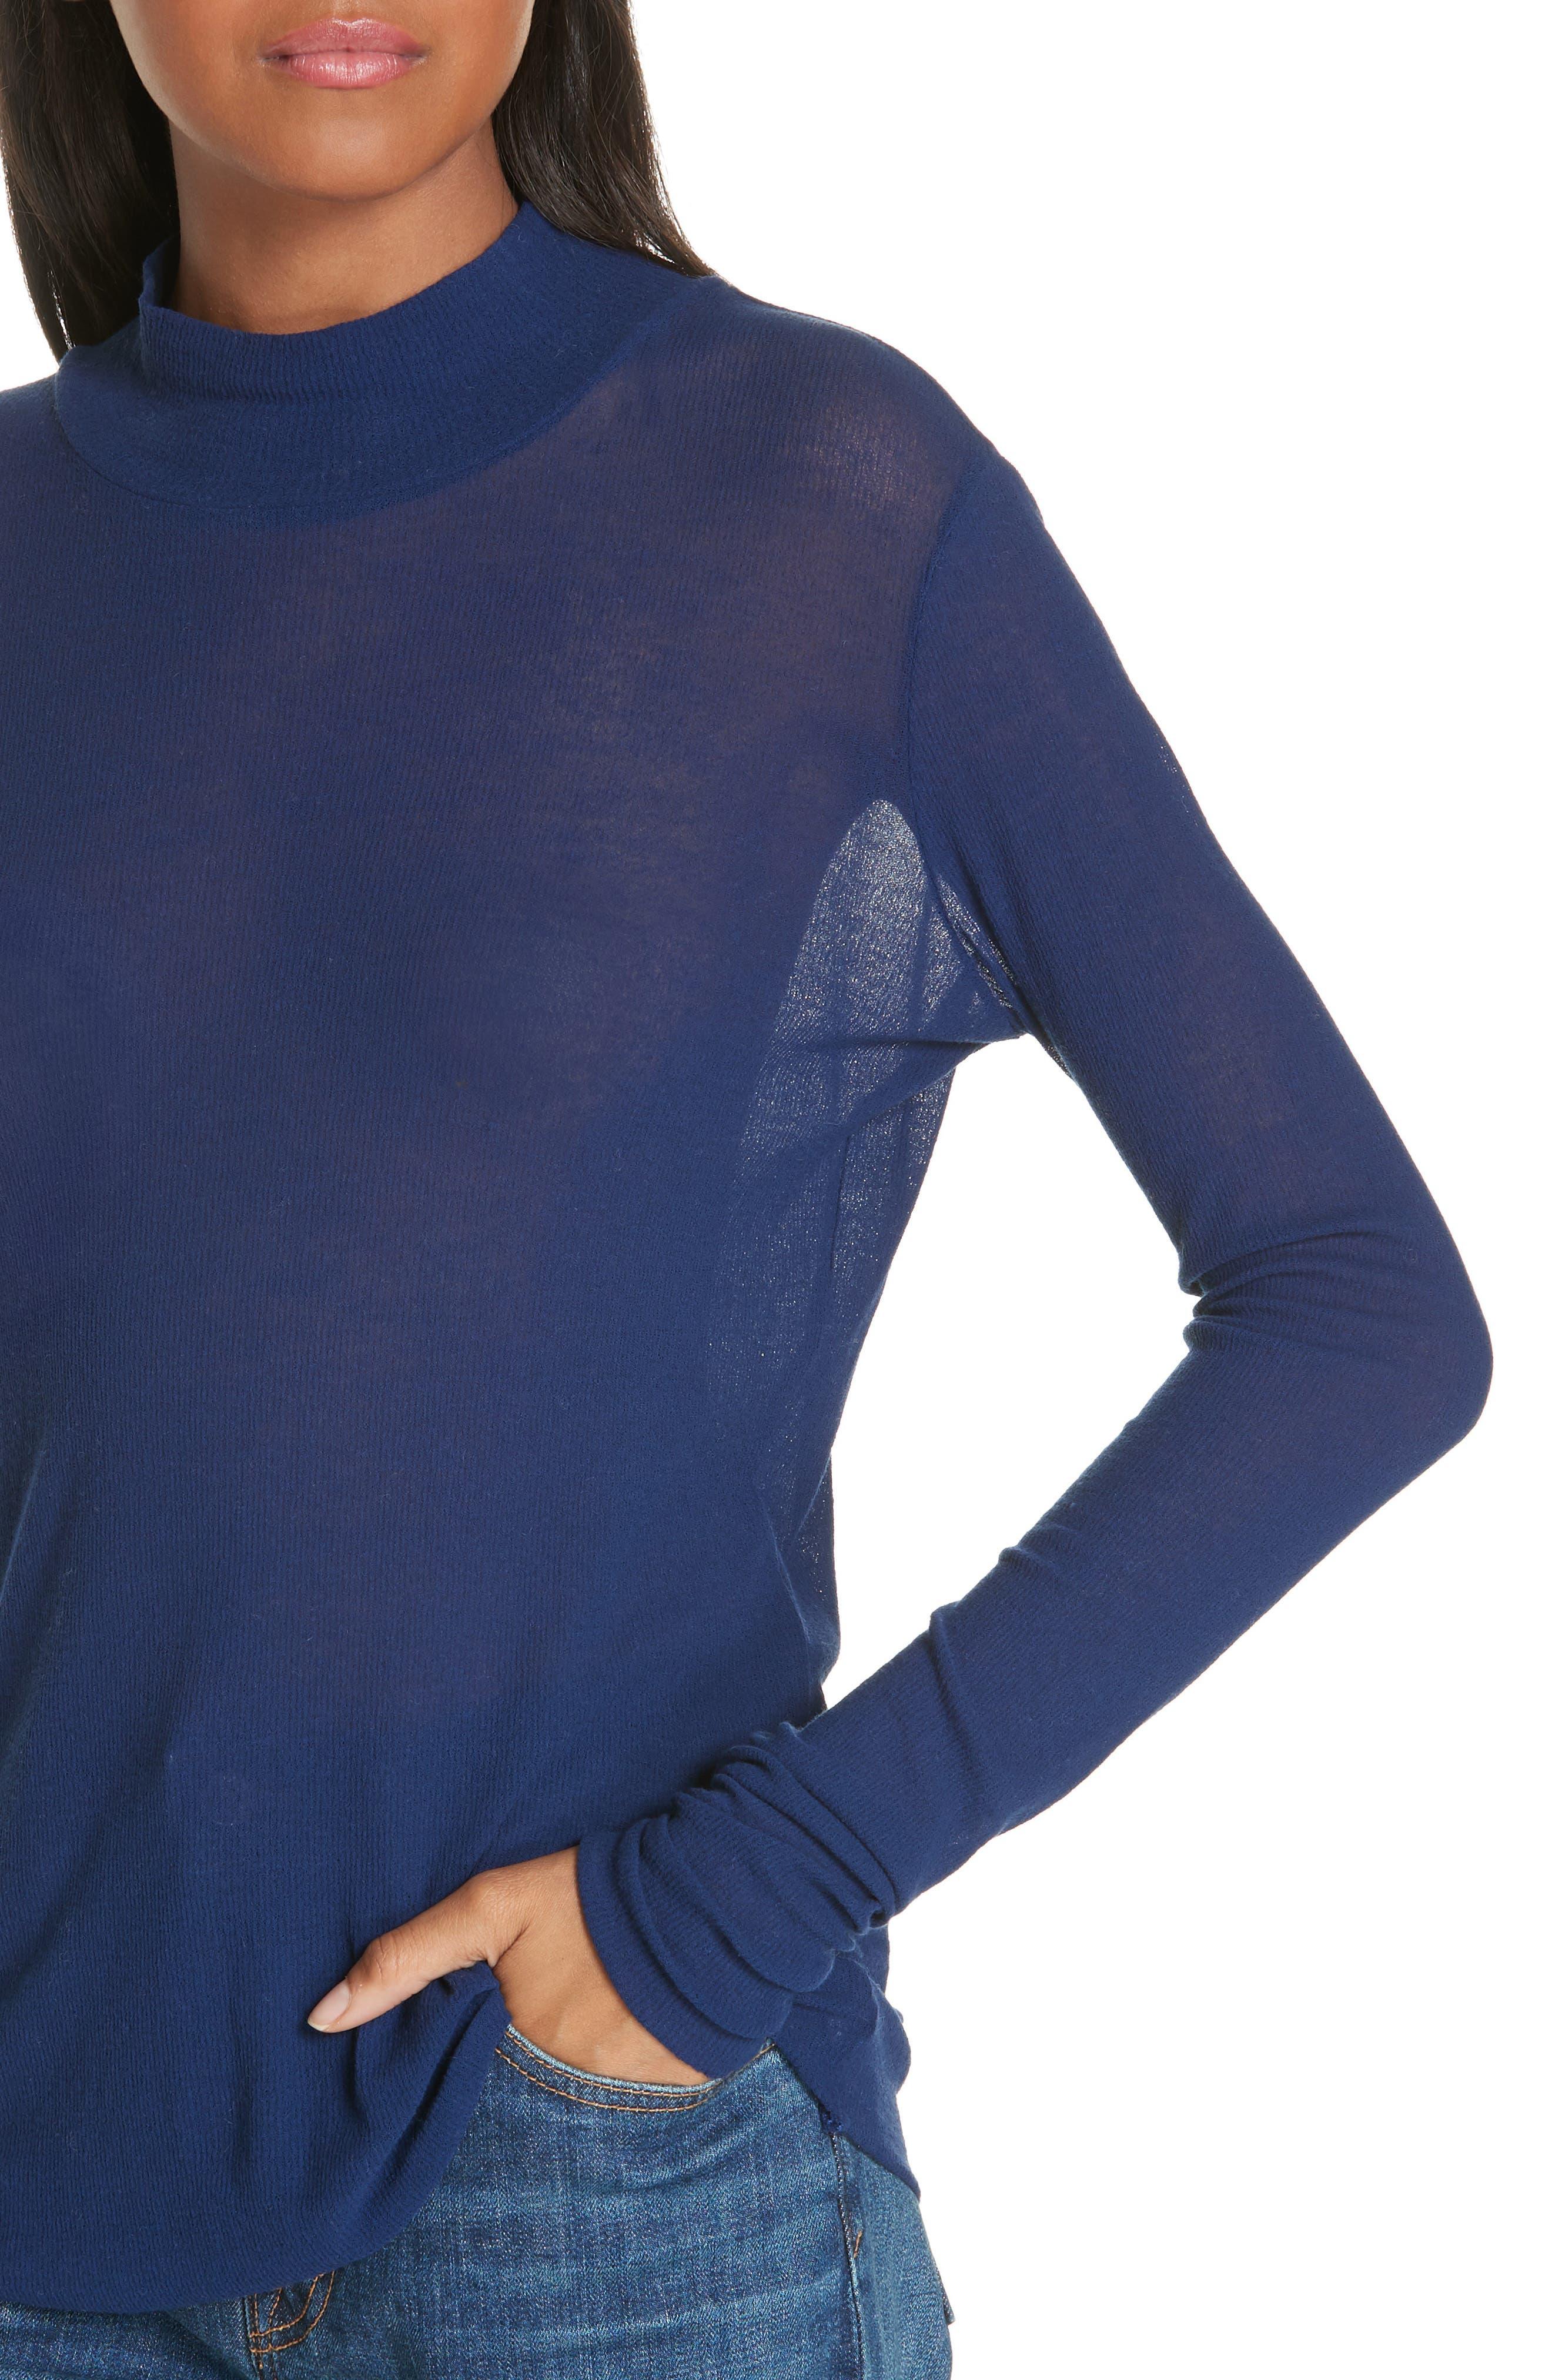 Turtleneck Sweater,                             Alternate thumbnail 4, color,                             406